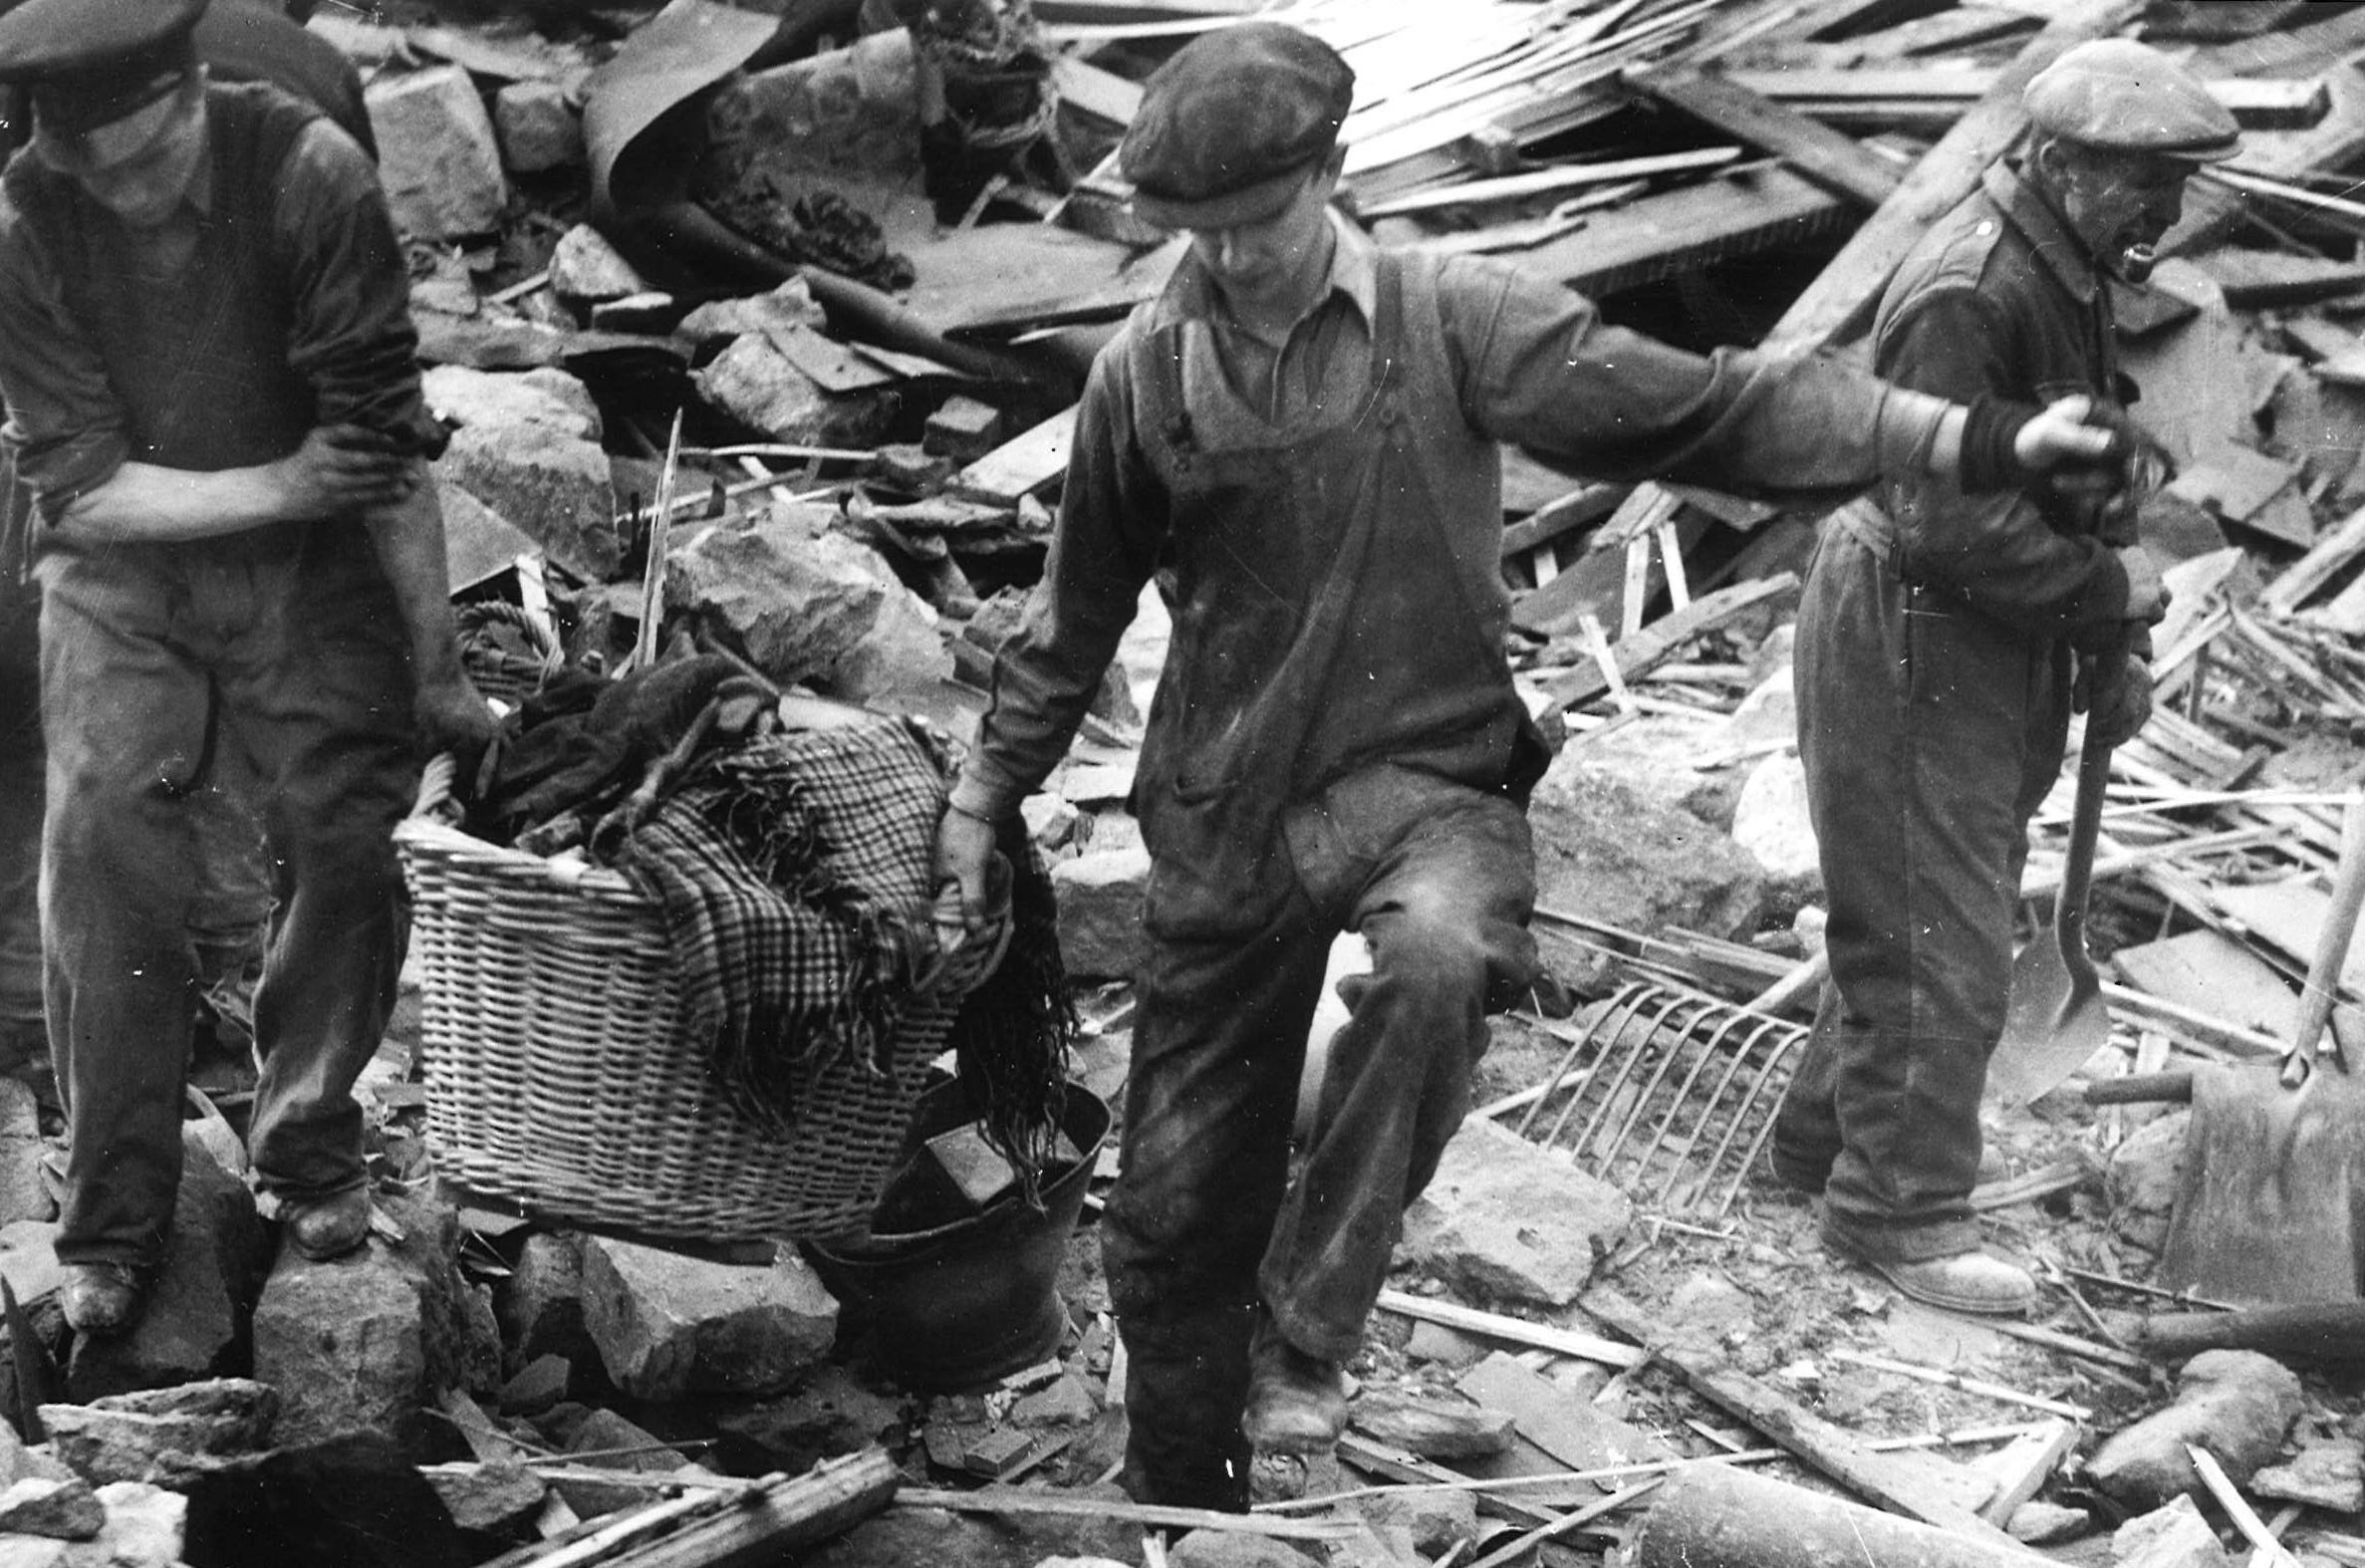 Bomb damage in Peterhead, 29 September 1941